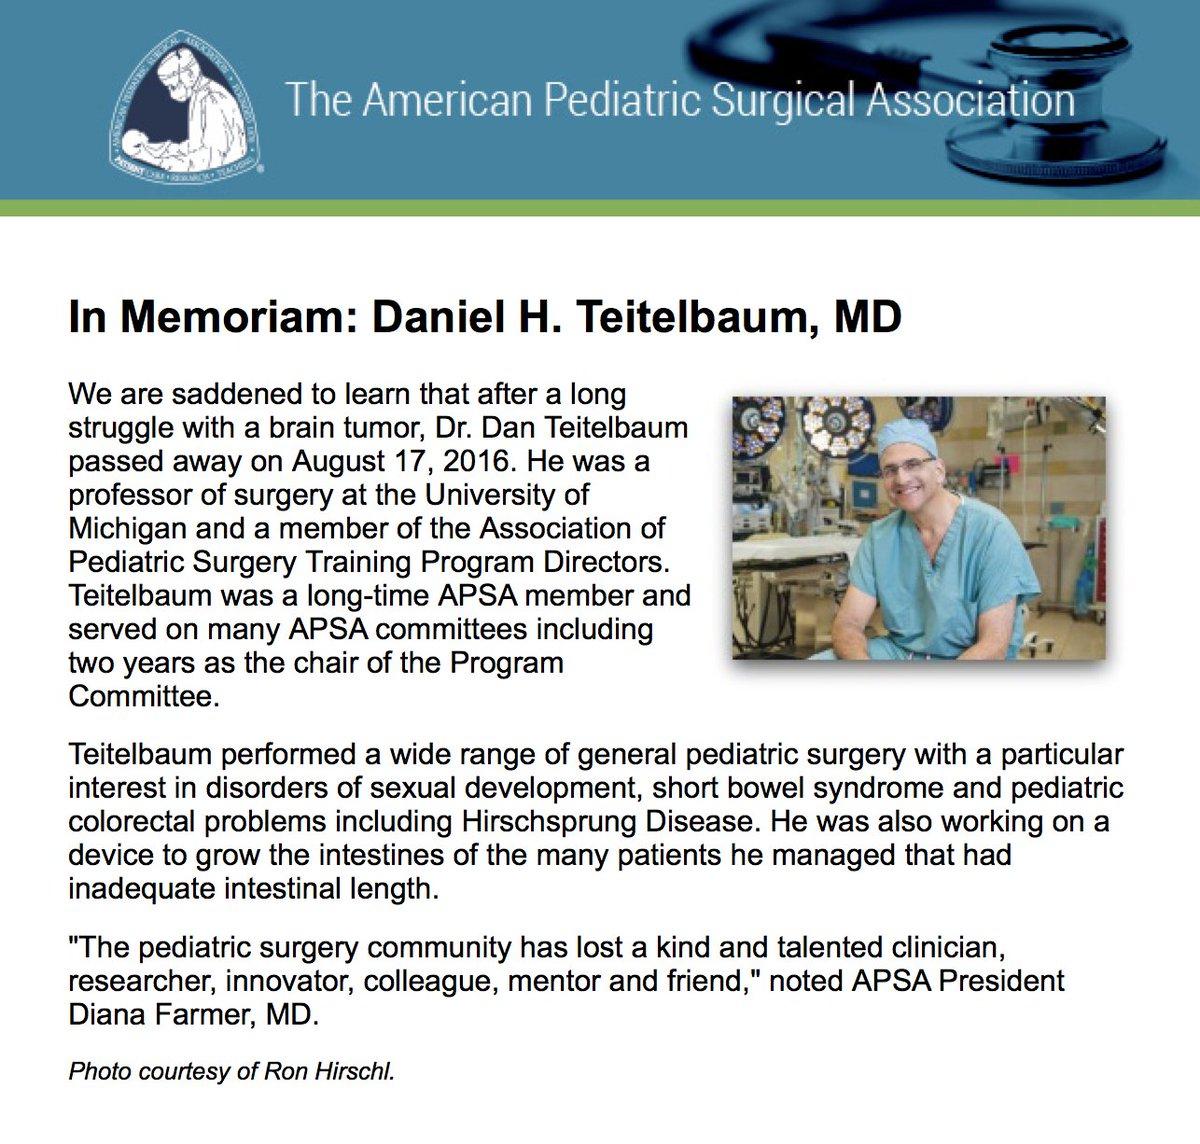 A very sad day for #pedsurg  R.I.P.   Dan Teitelbaum, MD, FACS, FAAP  @APSASurgeons @AmCollSurgeons  @AmerAcadPeds https://t.co/W51Yp37kpI